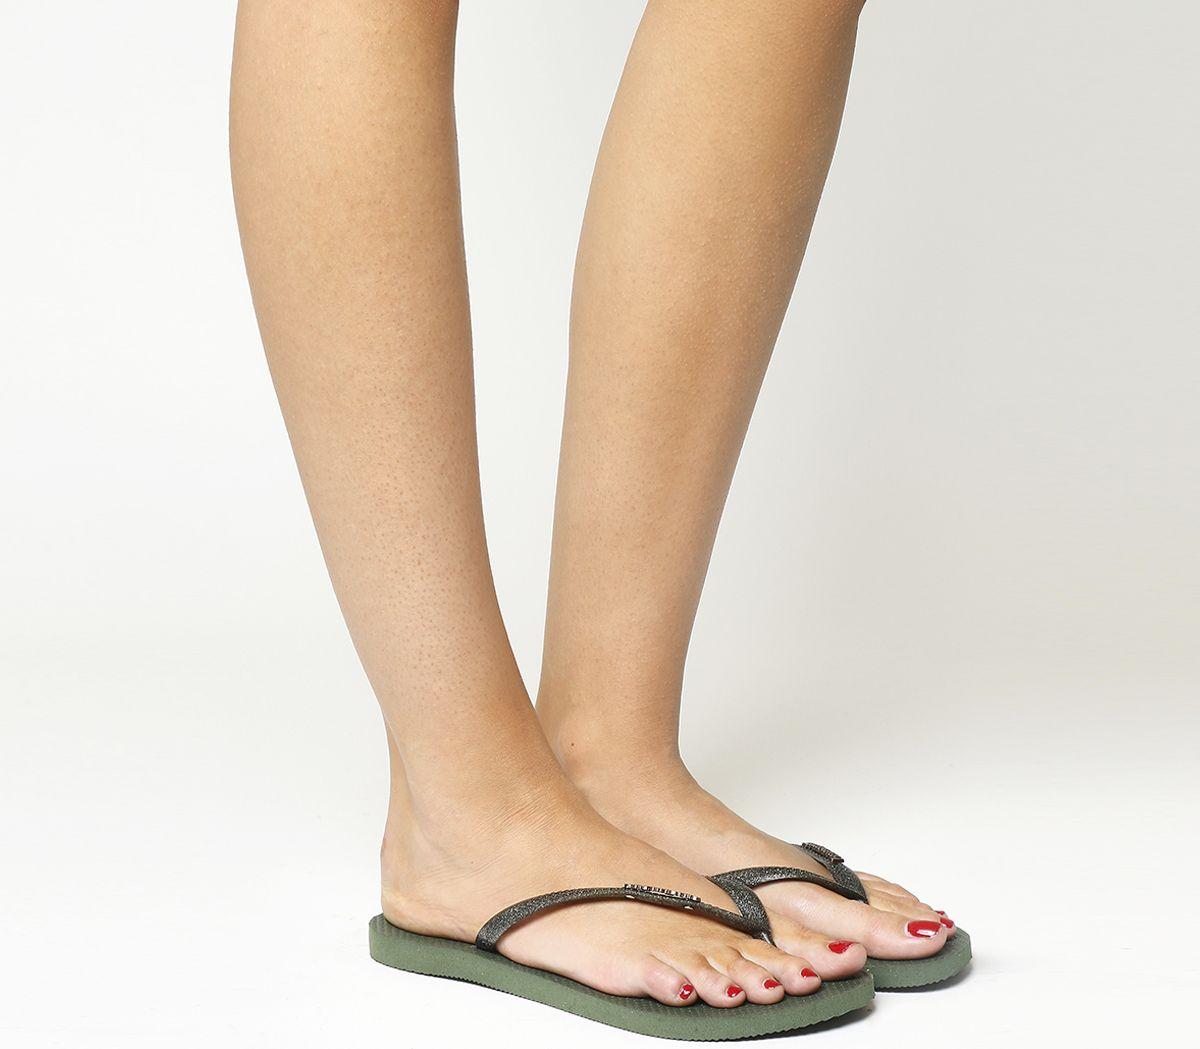 27a77b994 Havaianas Slim Logo Metallic Flip Flops Green Olive - Sandals